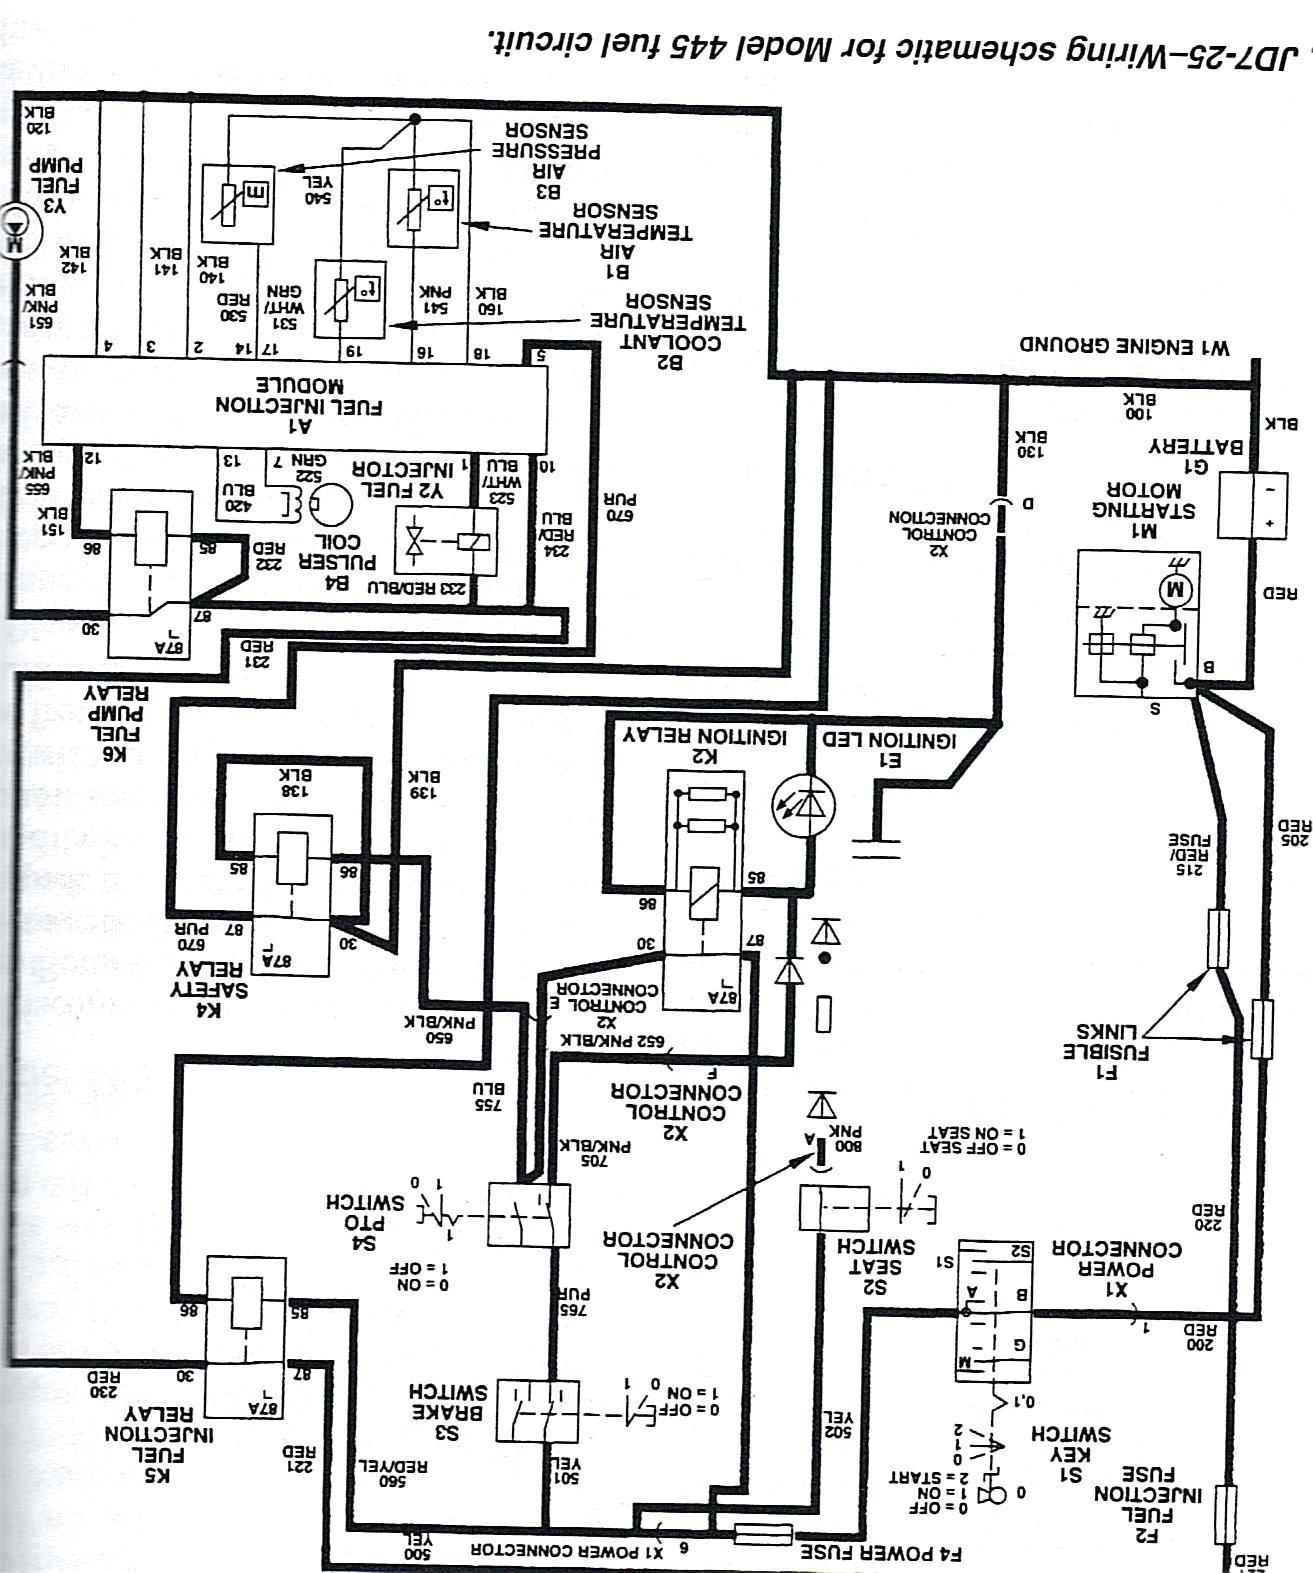 hight resolution of john deere lt 133 wiring diagram wiring diagram image john deere 180 wiring diagram john